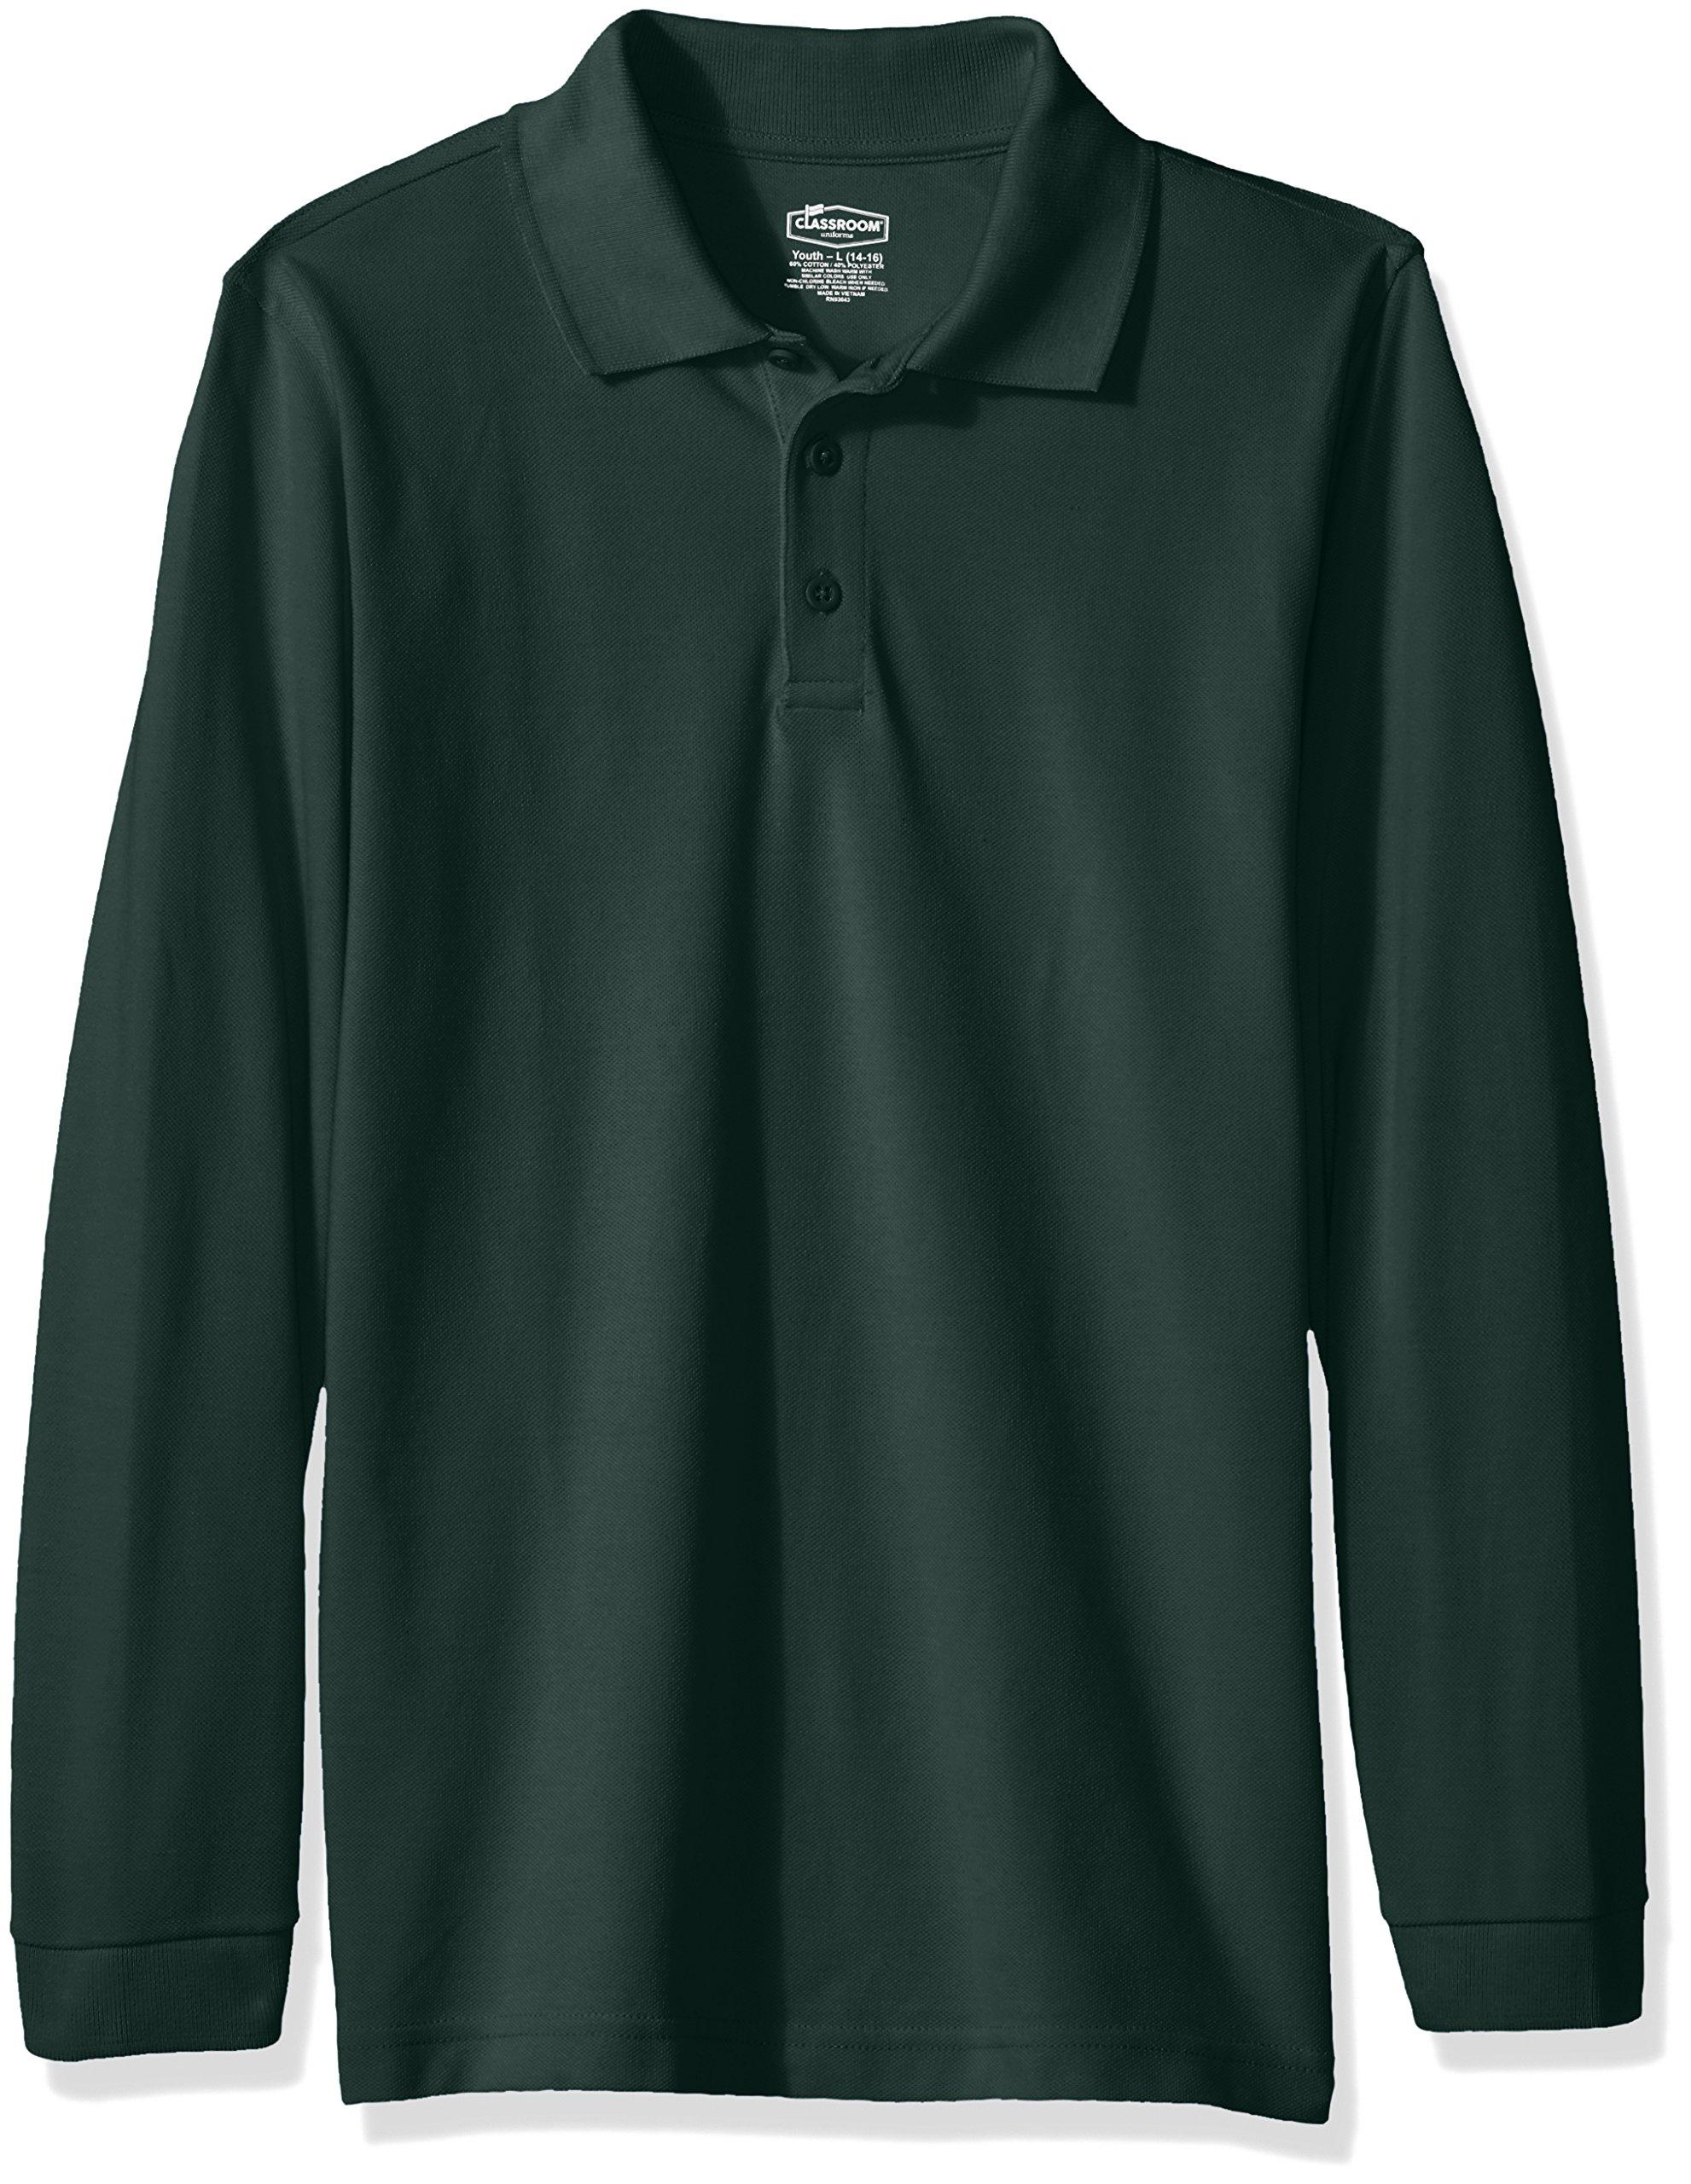 Classroom Big Kids Boys' Uniform Long Sleeve Pique Polo, Sos Hunter Green, L